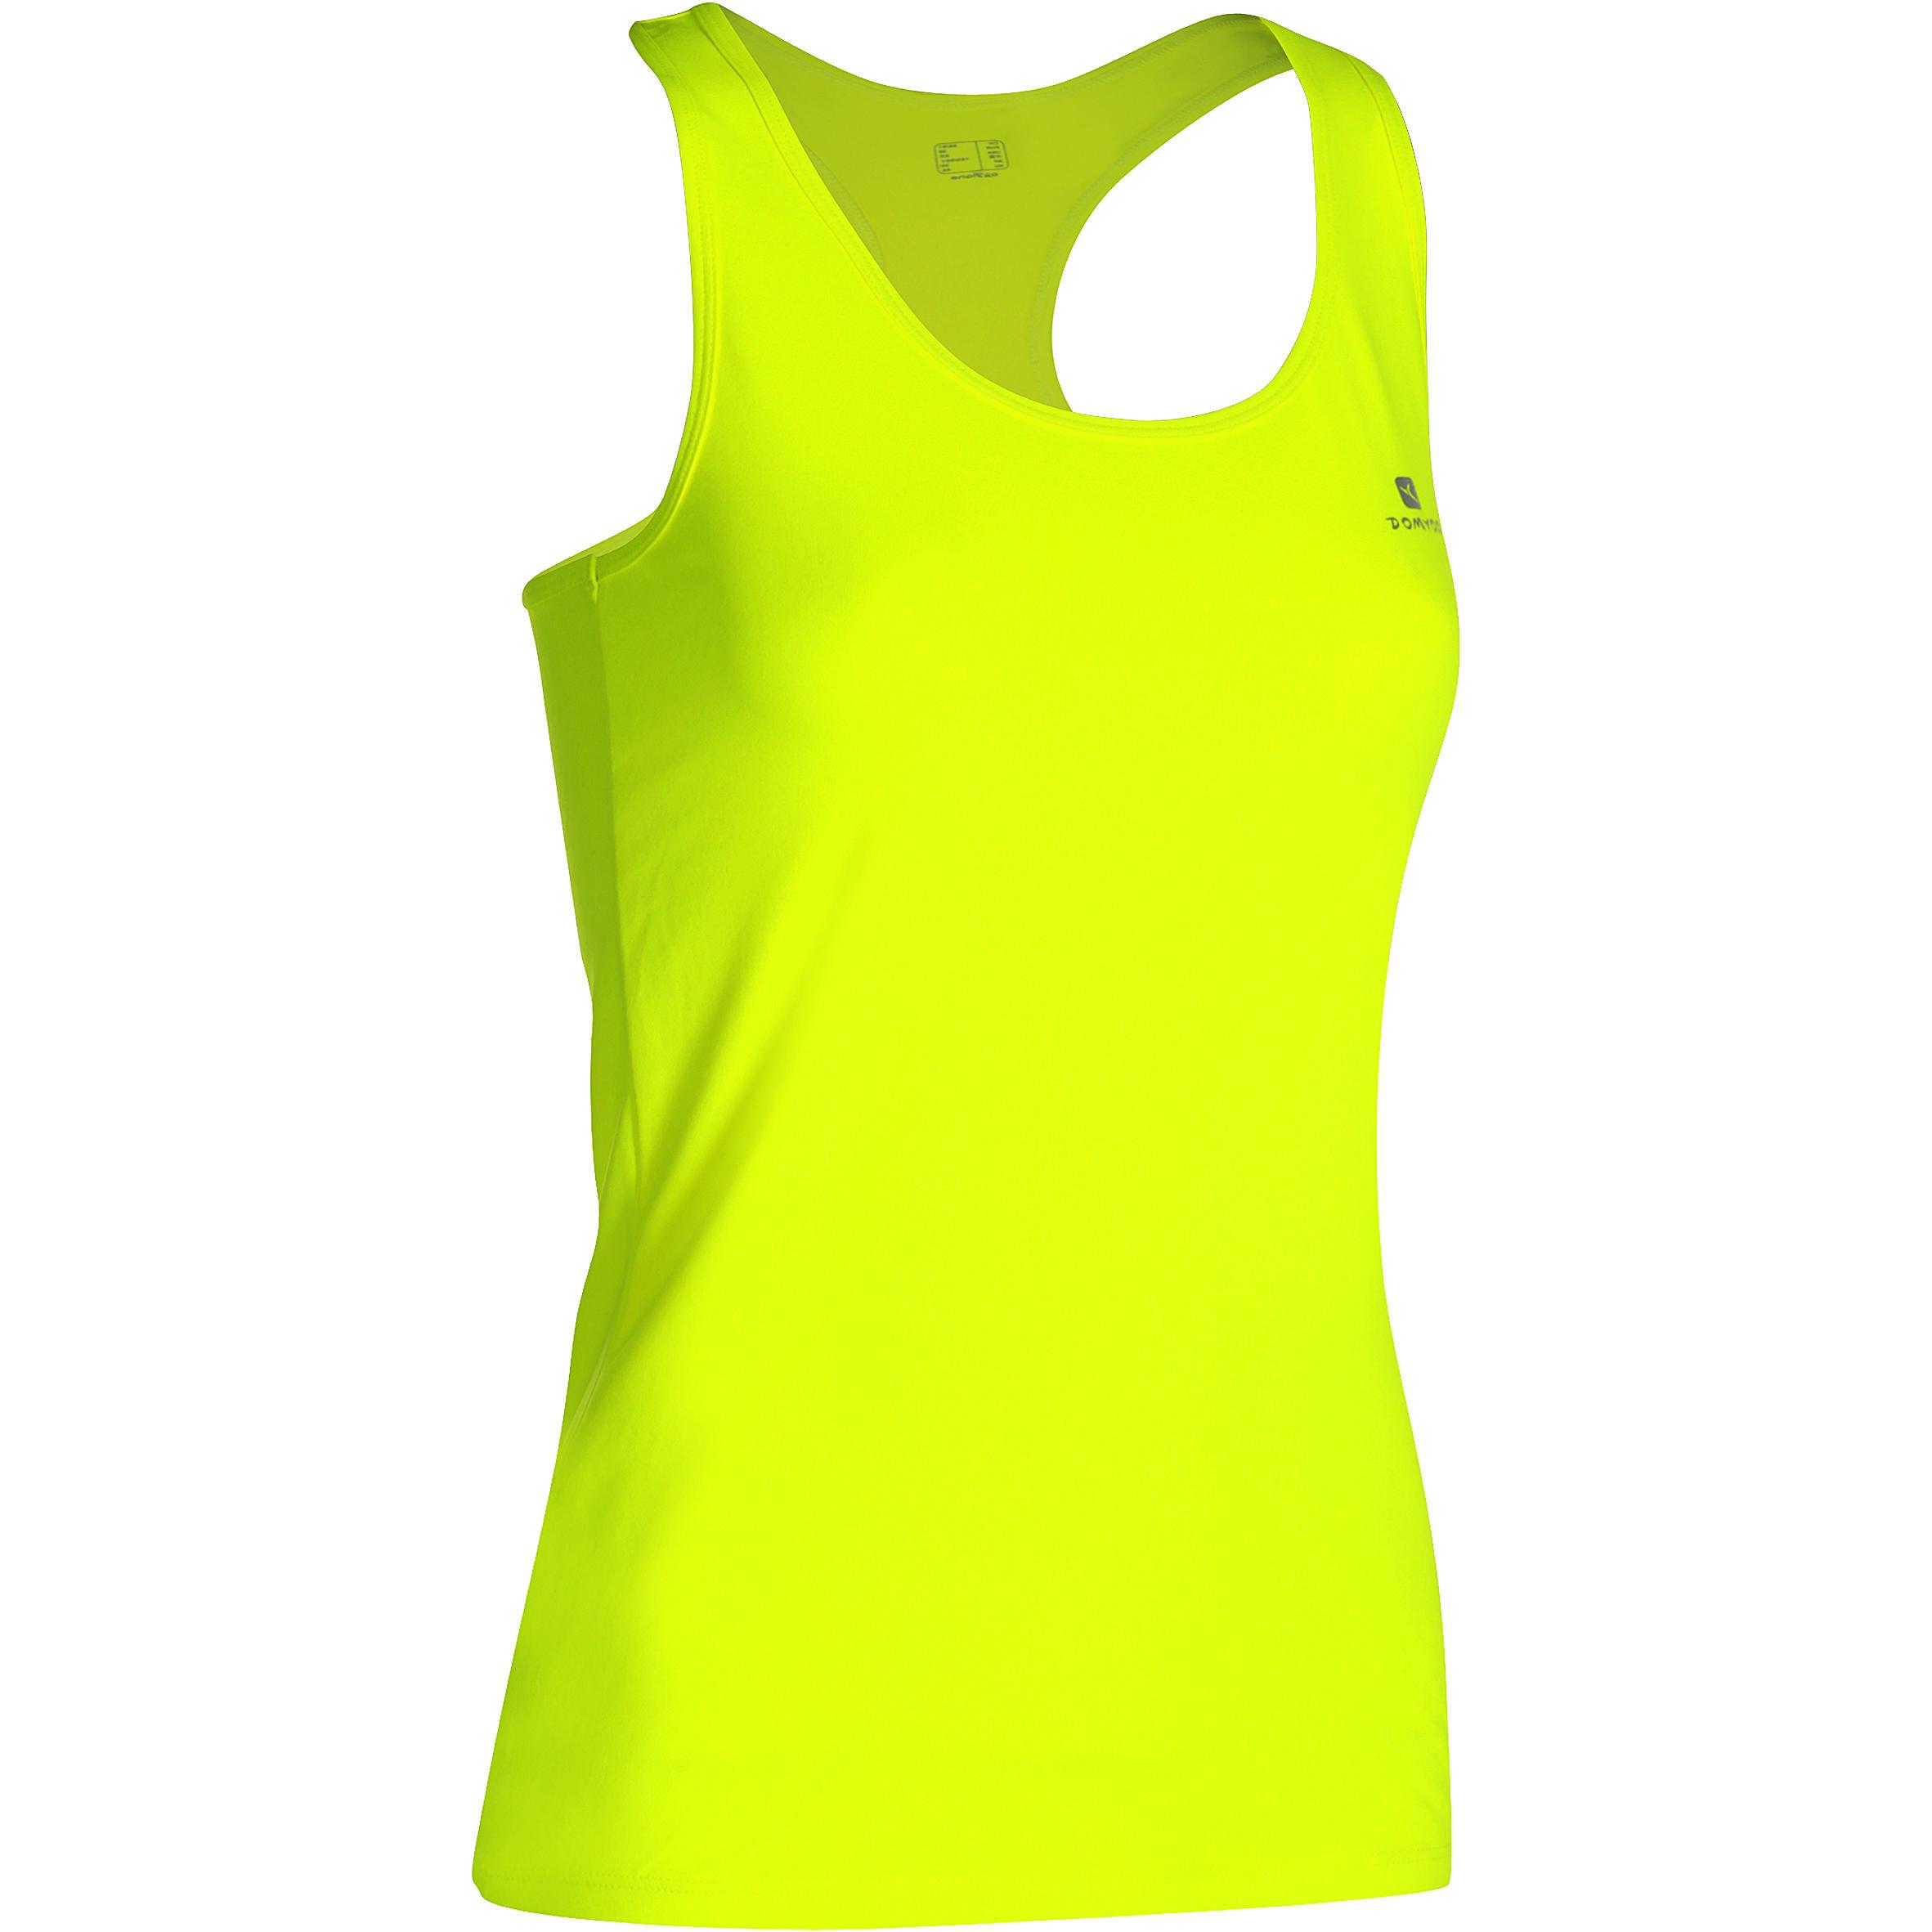 Camiseta sin mangas fitness cardio mujer amarillo fluo MY TOP